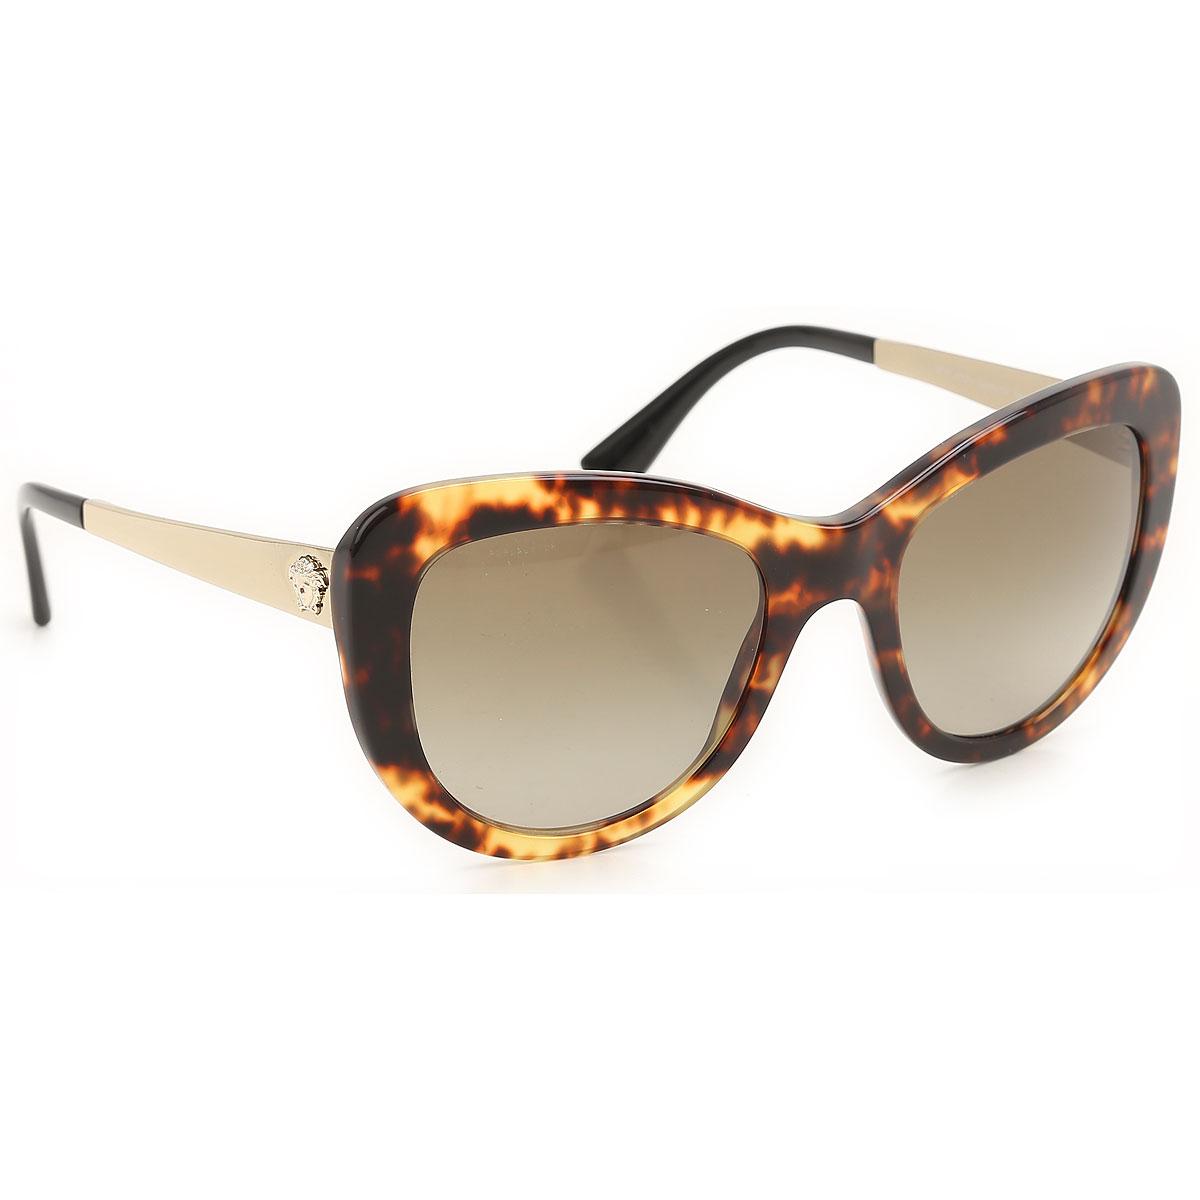 4ca31efdcb92 Sunglasses Gianni Versace